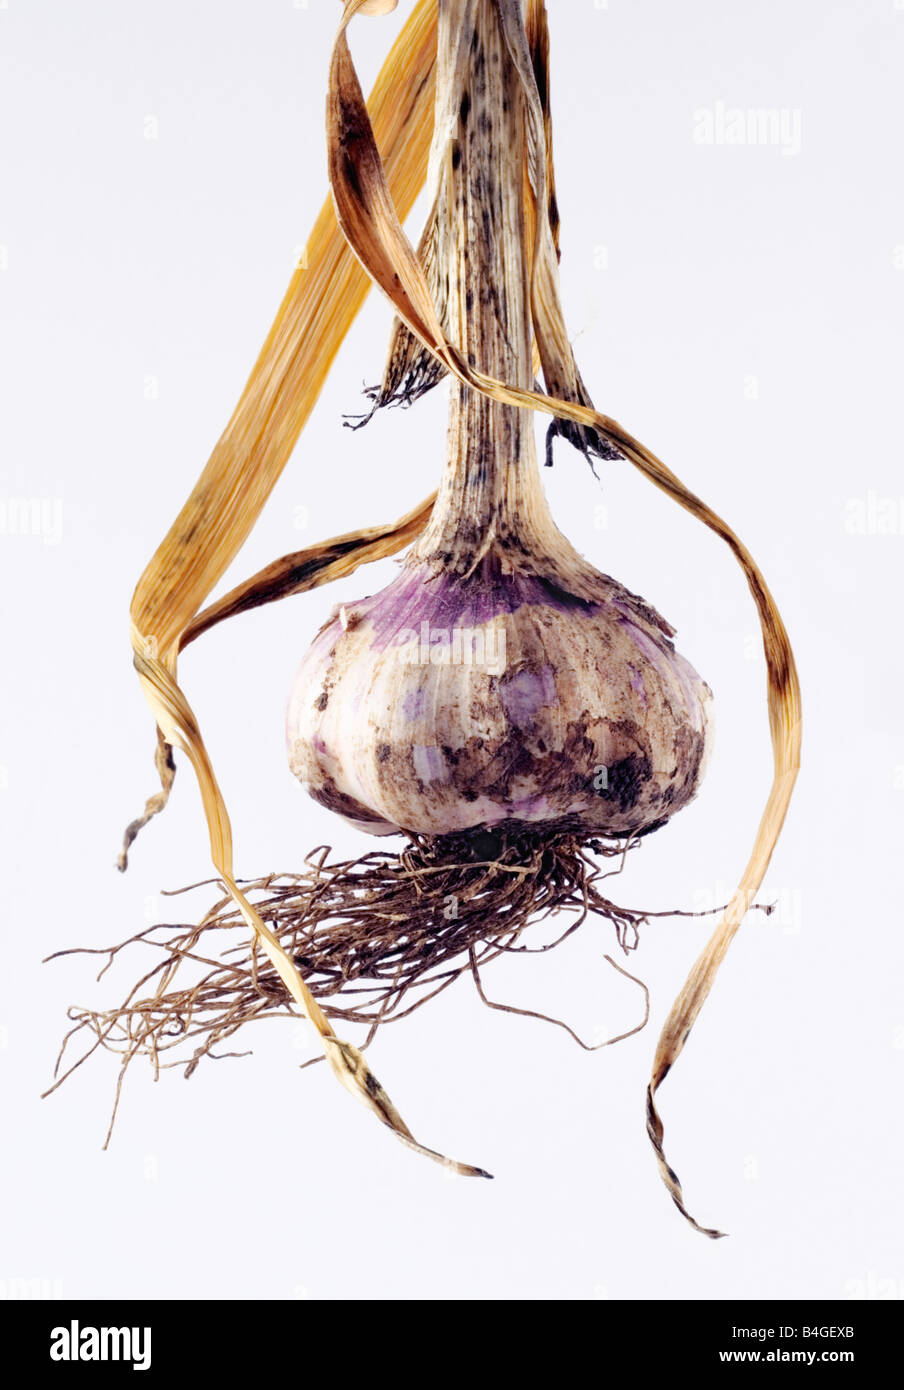 Garlic bulb freshly harvested Stock Photo